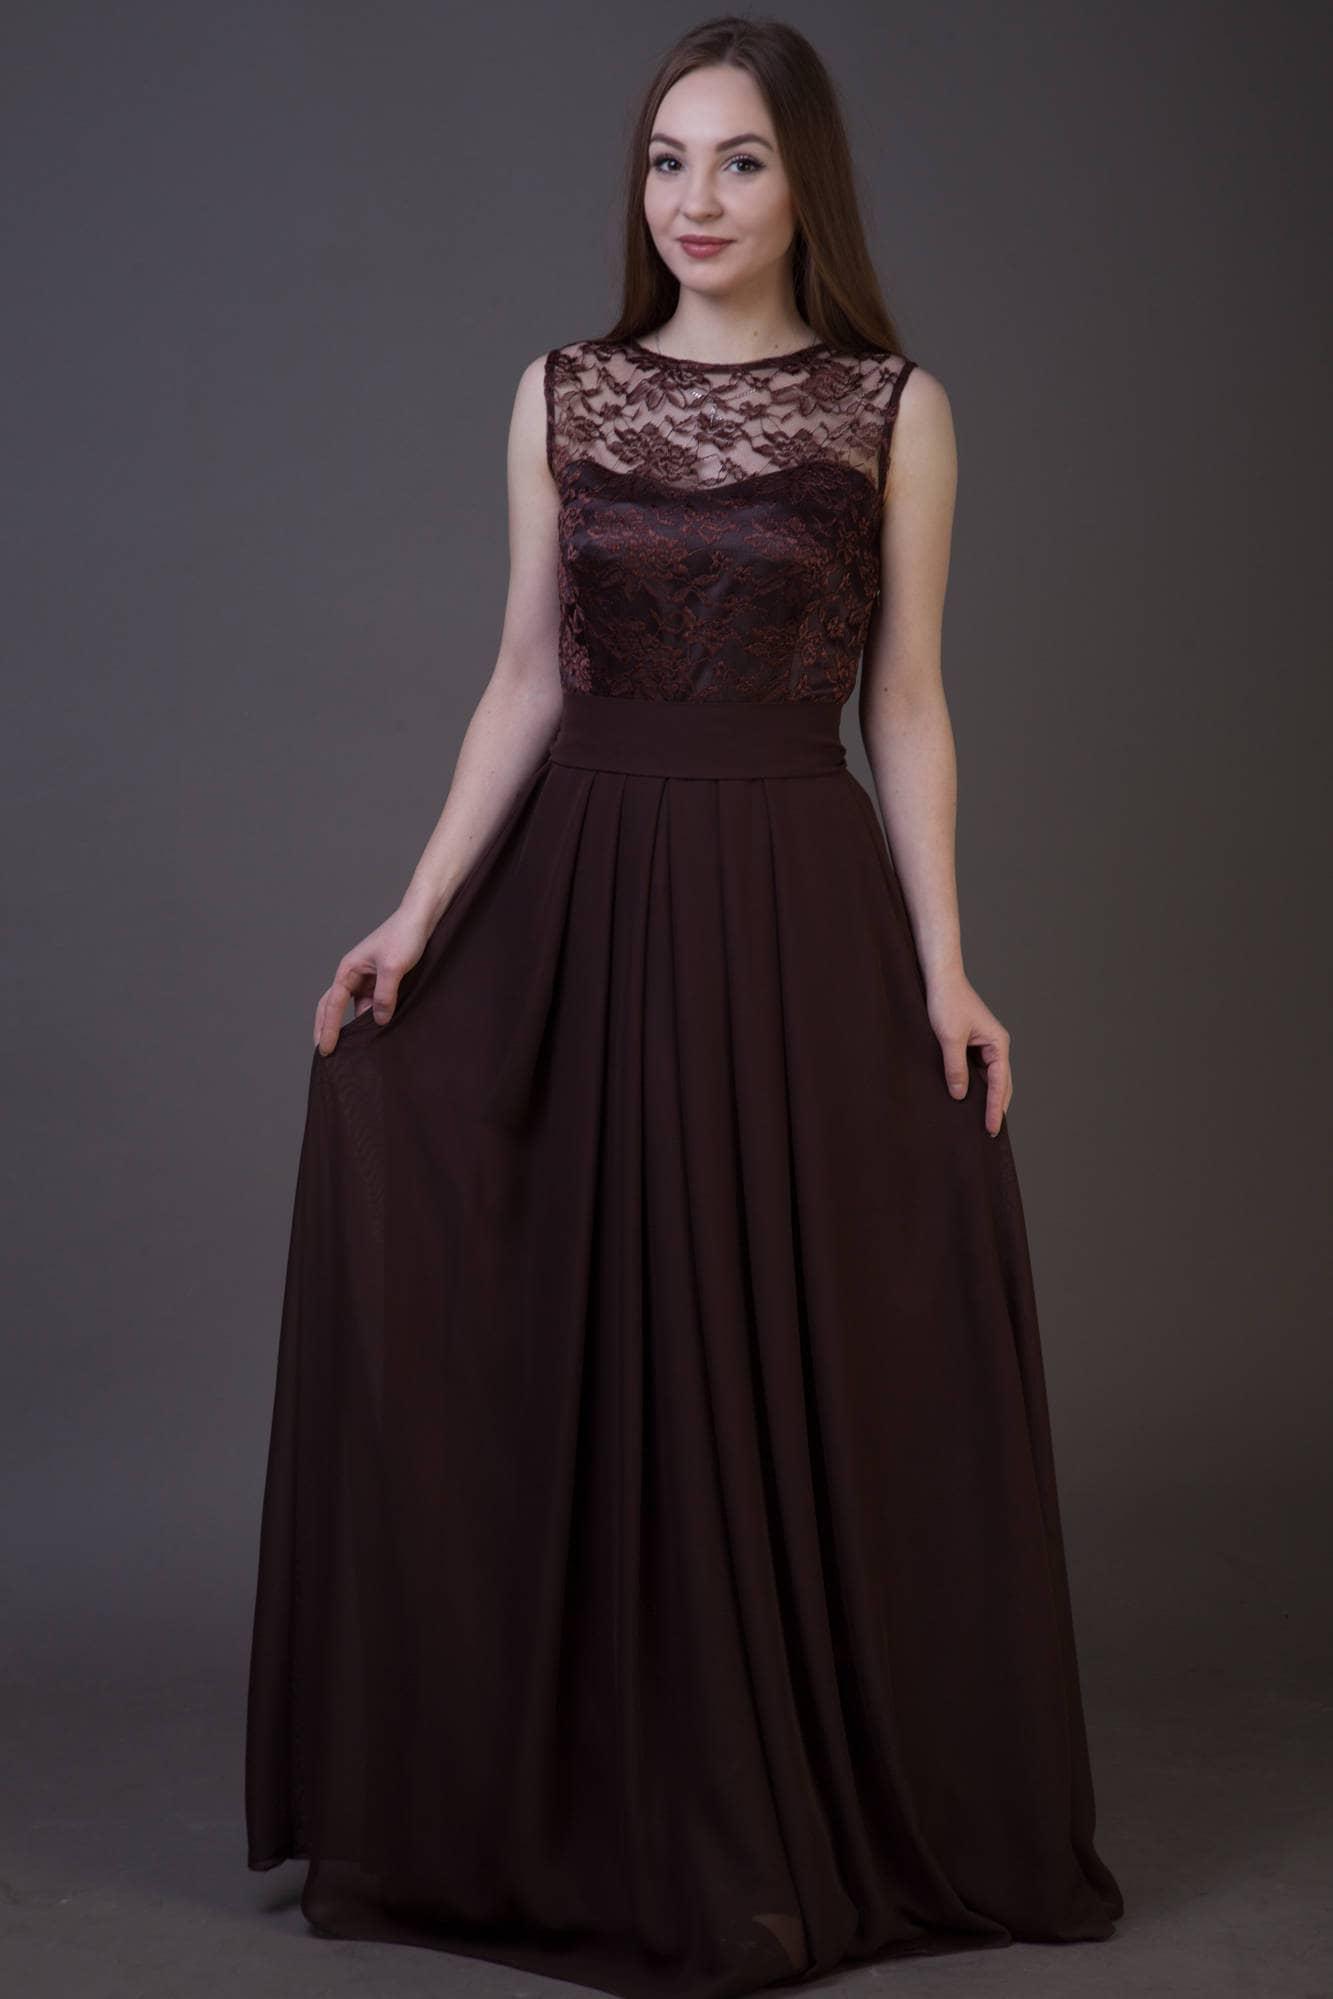 Dark brown bridesmaid dress chocolate brown bridesmaid dress description lace dark brown dress ombrellifo Choice Image